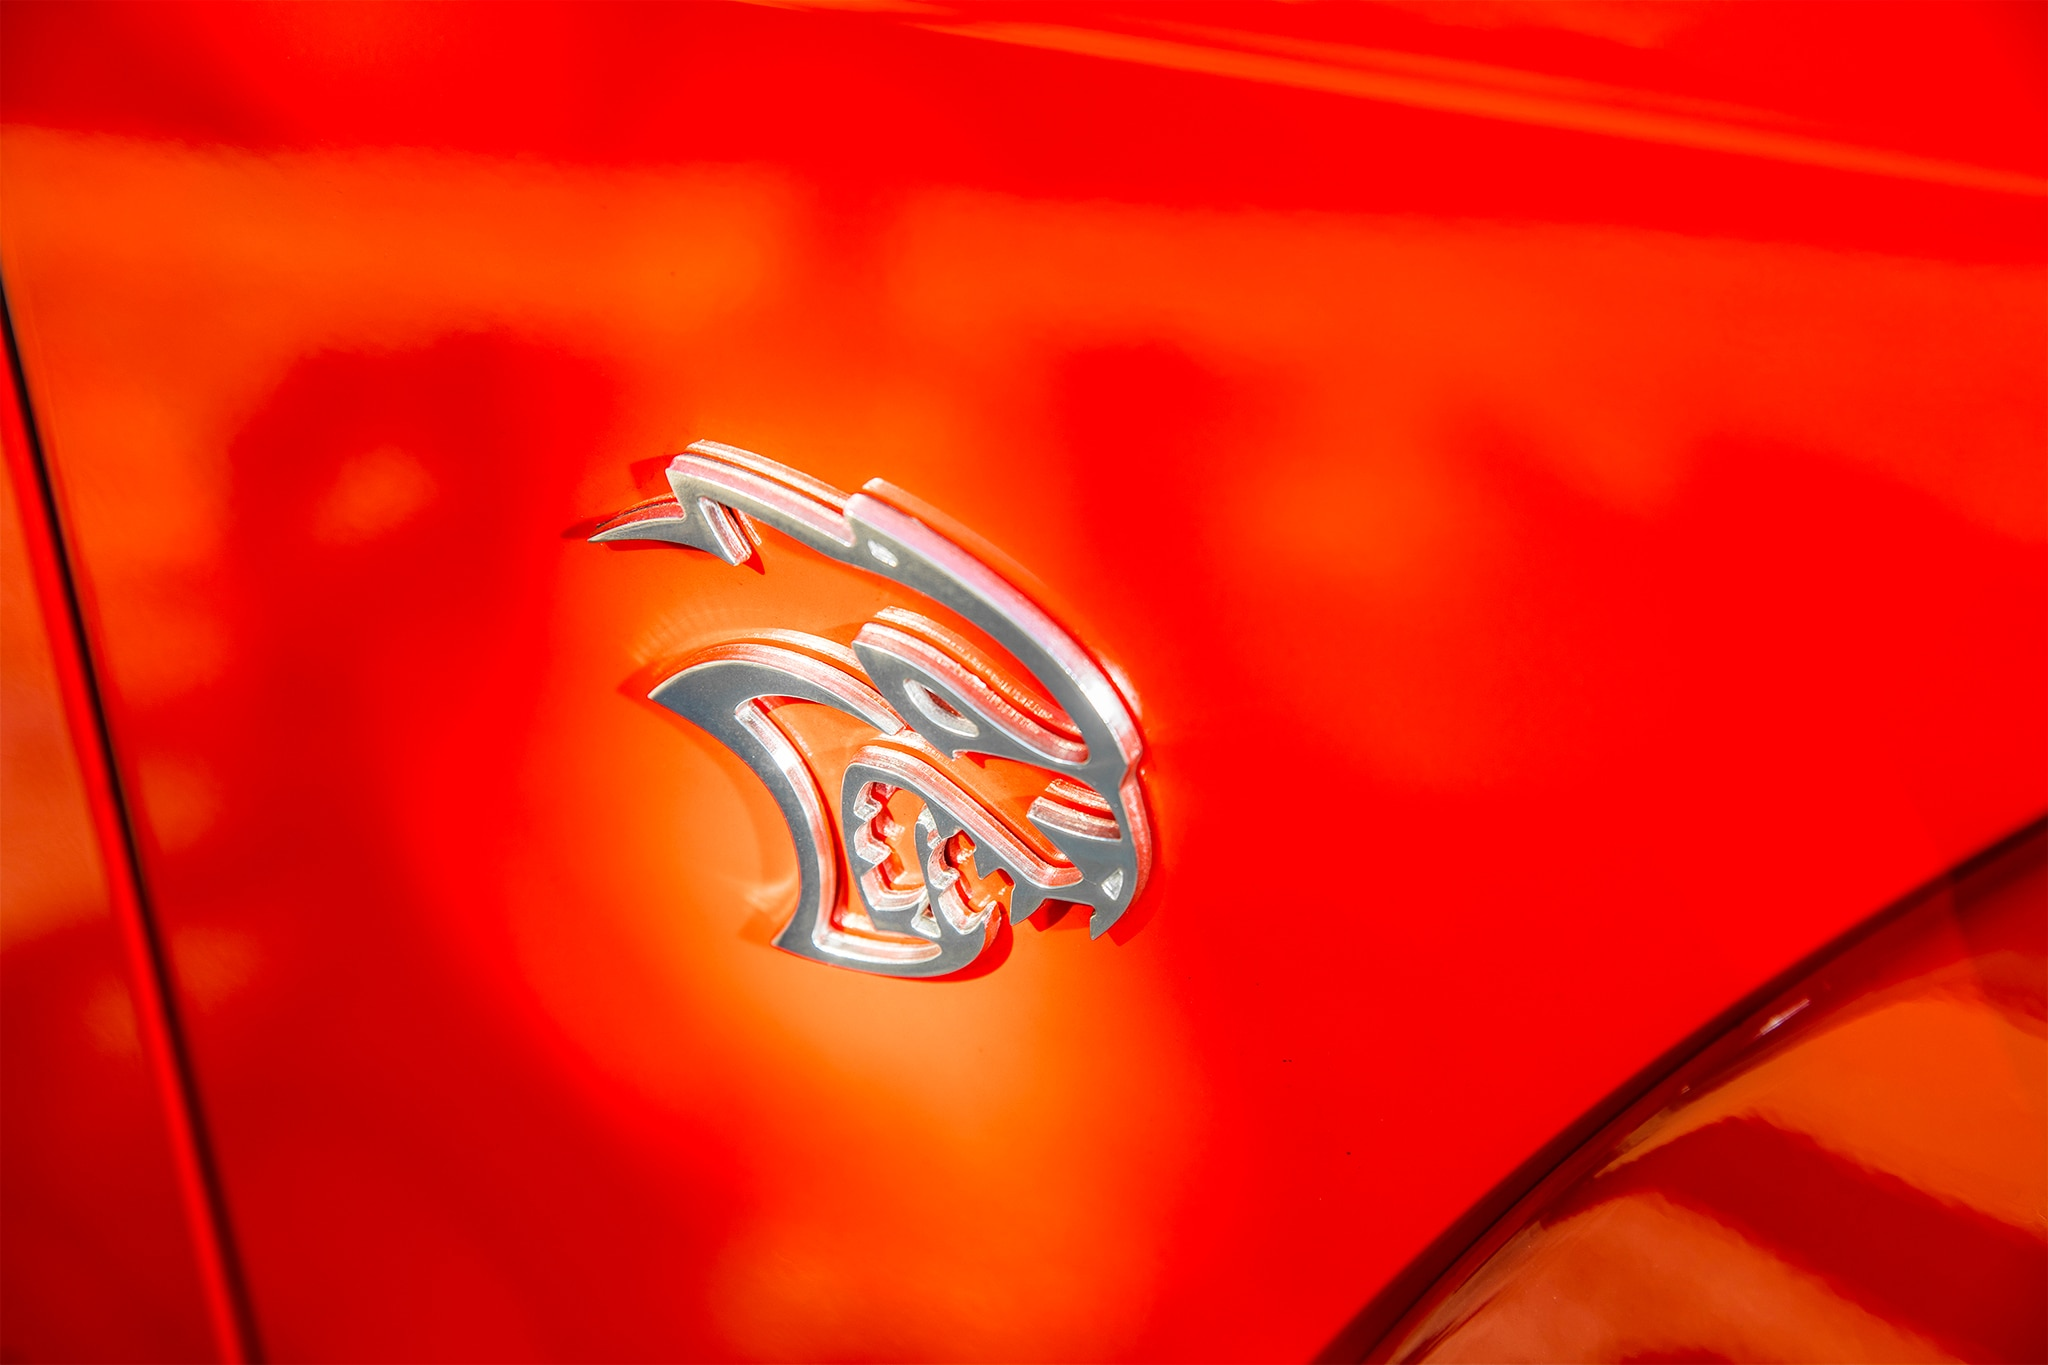 2018 Dodge Challenger Price >> 2018 Dodge Challenger SRT Hellcat Widebody Track Drive ...